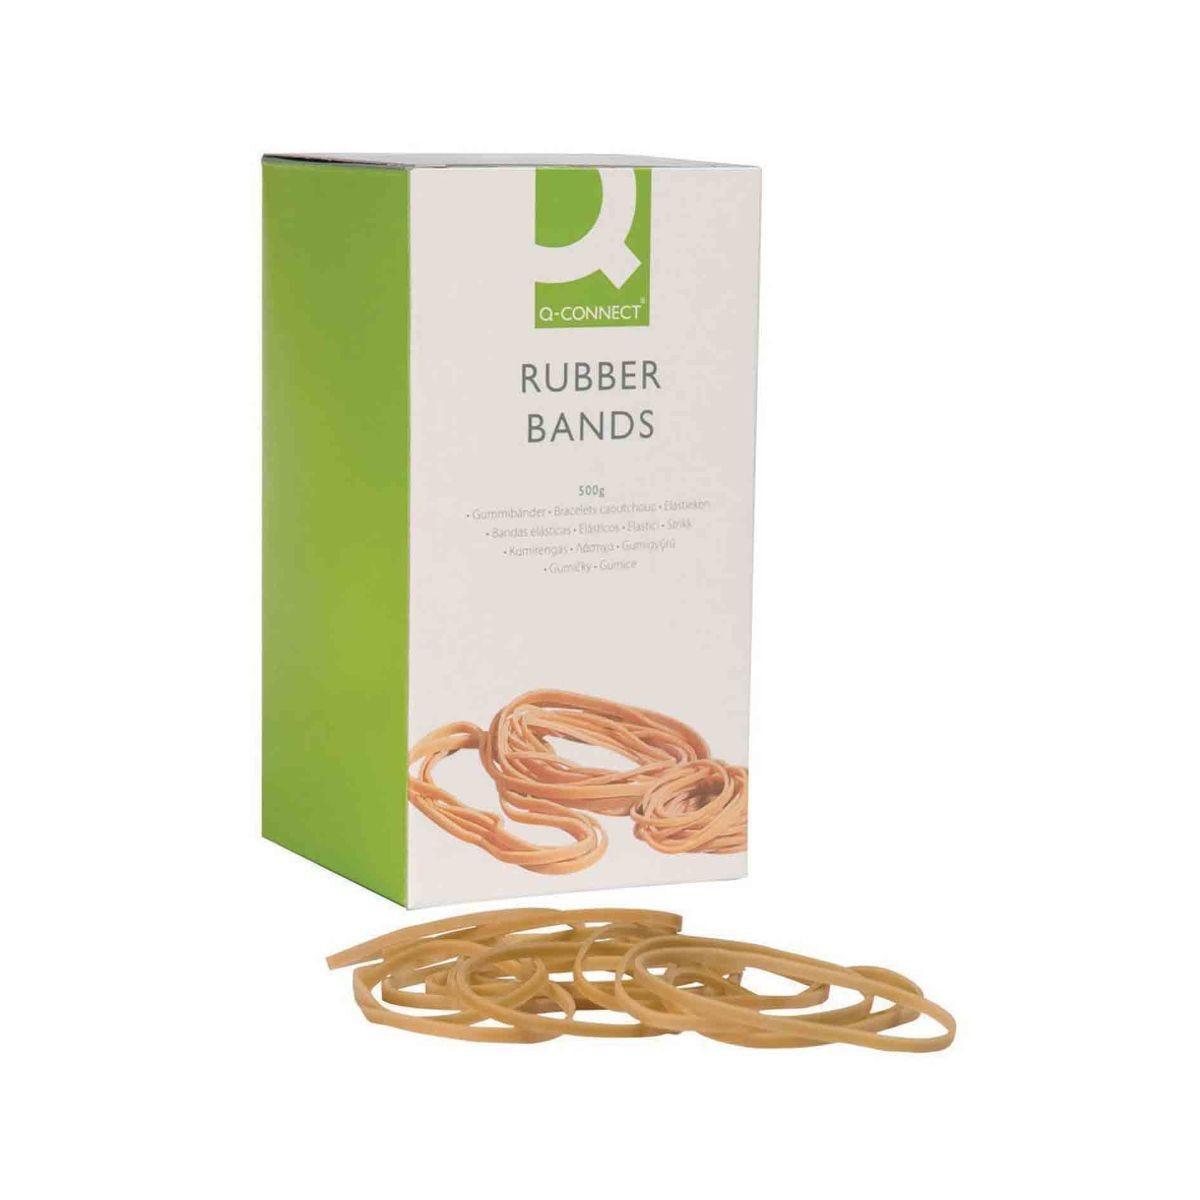 Q-Connect Rubber Bands No. 34 101.6 x 3.2mm 500g